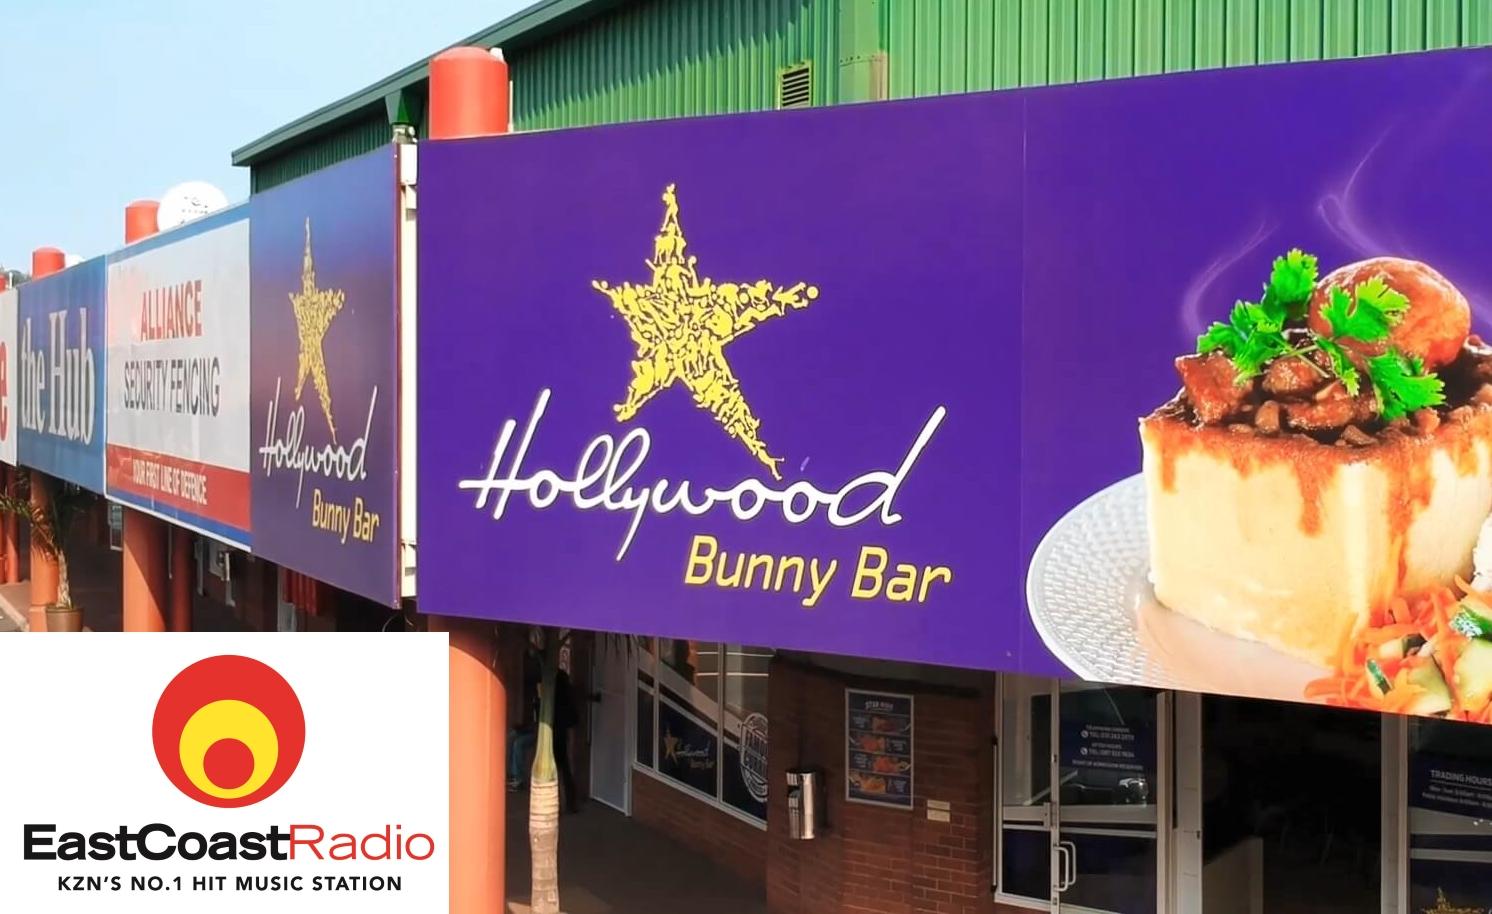 Hollywood Bunny Bar and East Coast Radio at the Springfield Retail Centre